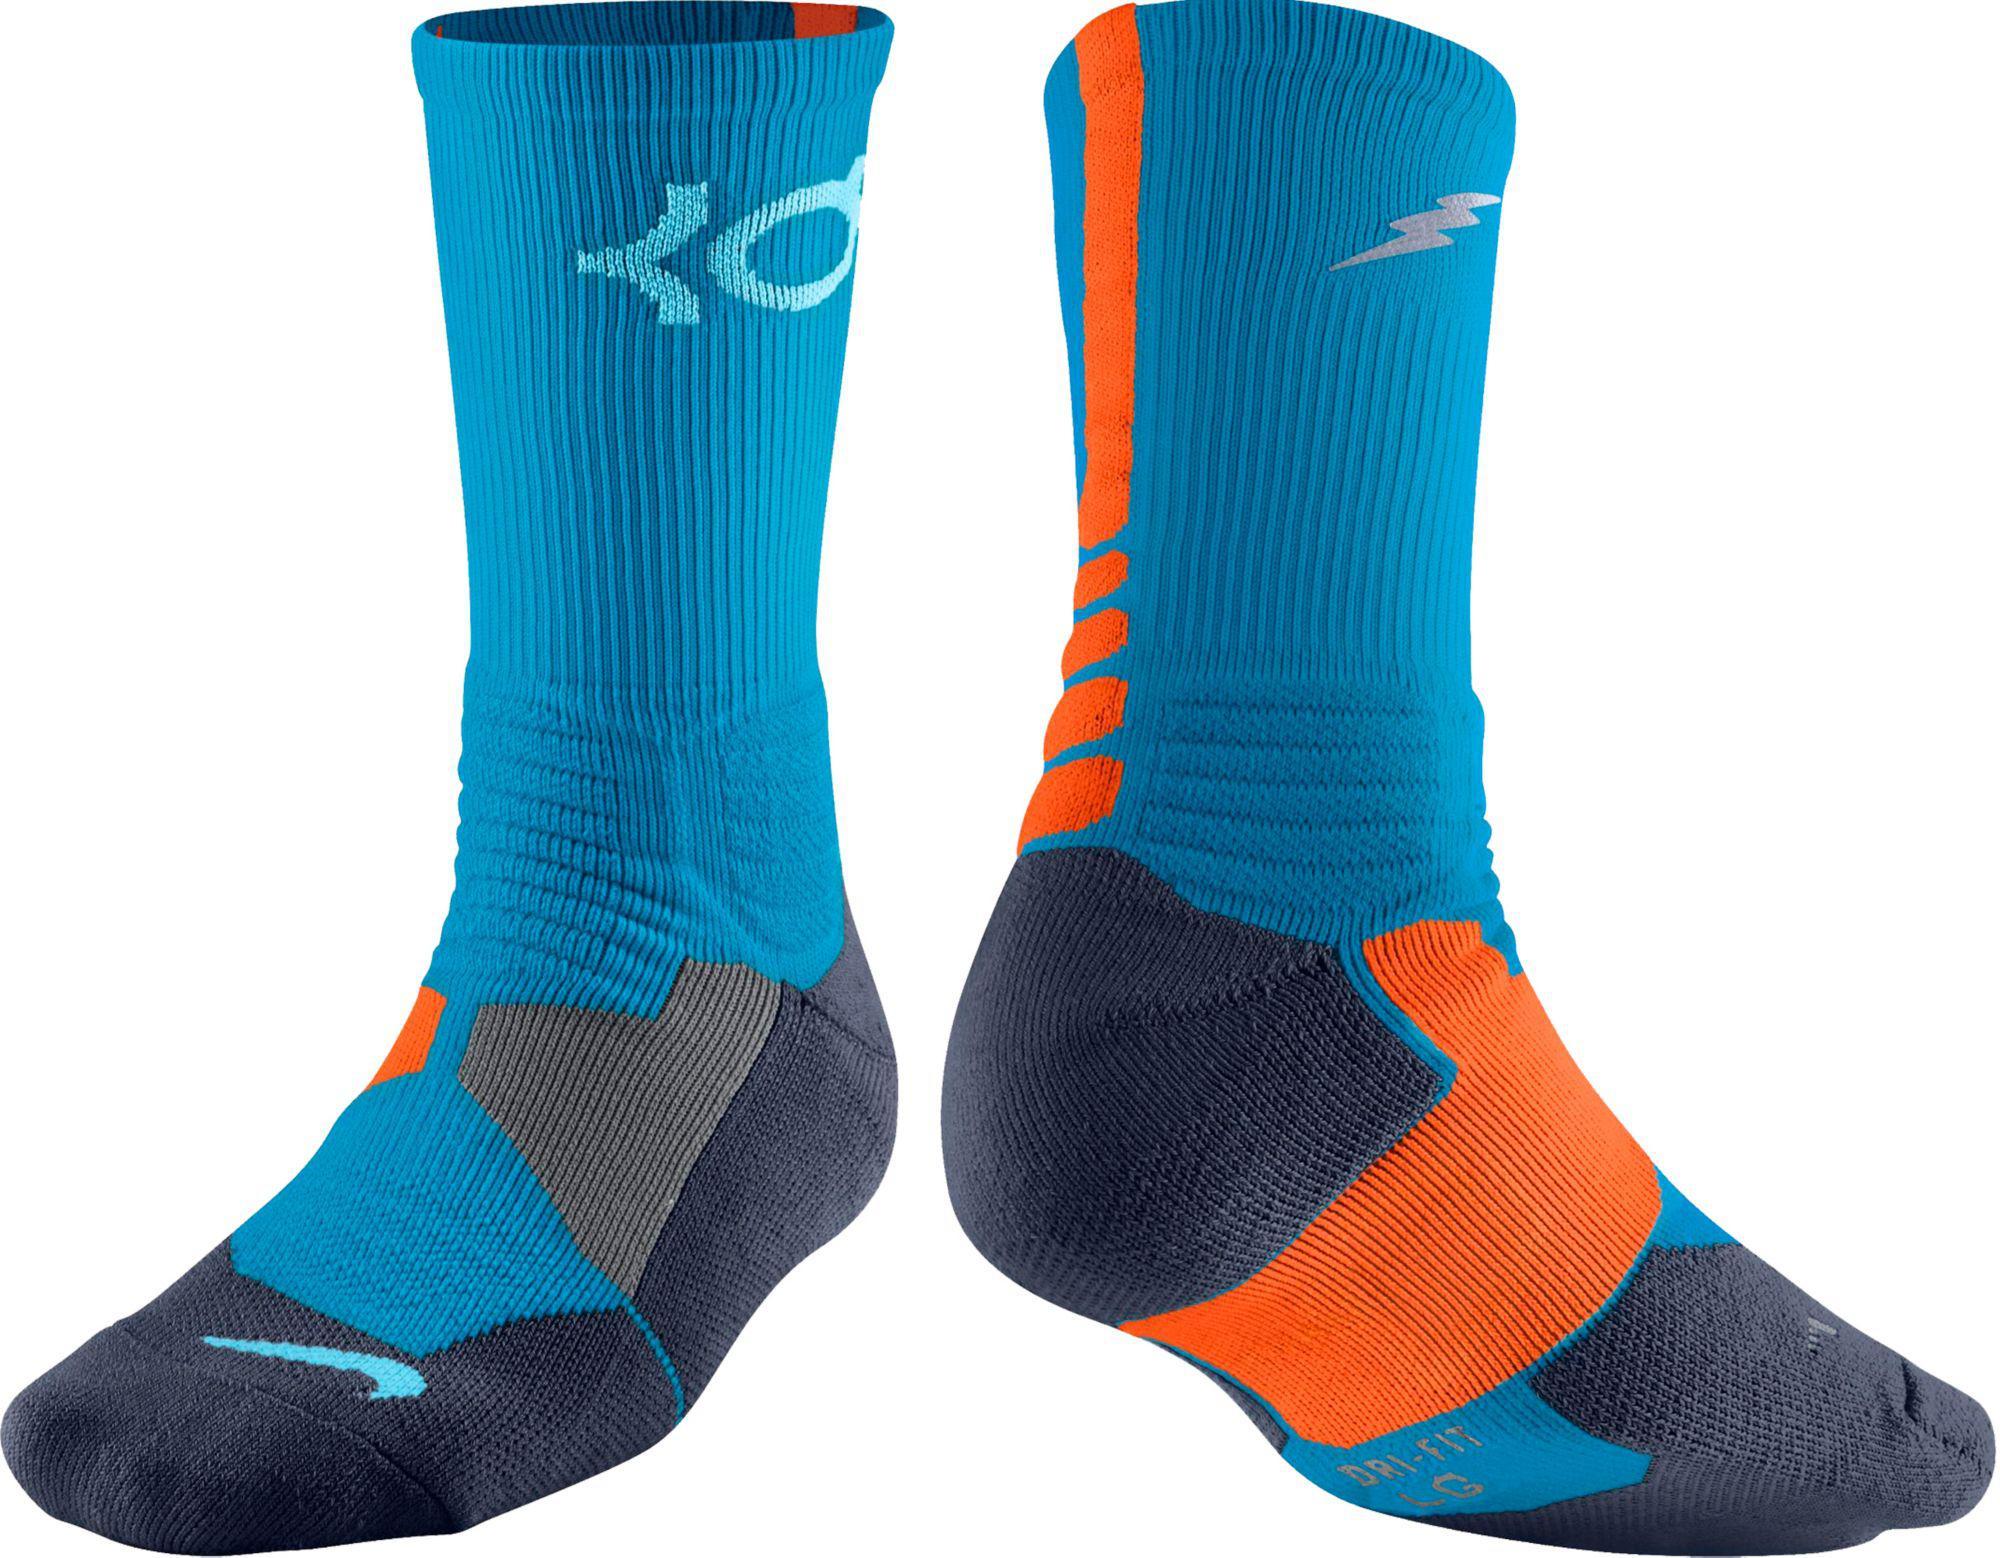 b57a102f9401 Lyst - Nike Kd Hyper Elite Crew Basketball Socks in Blue for Men